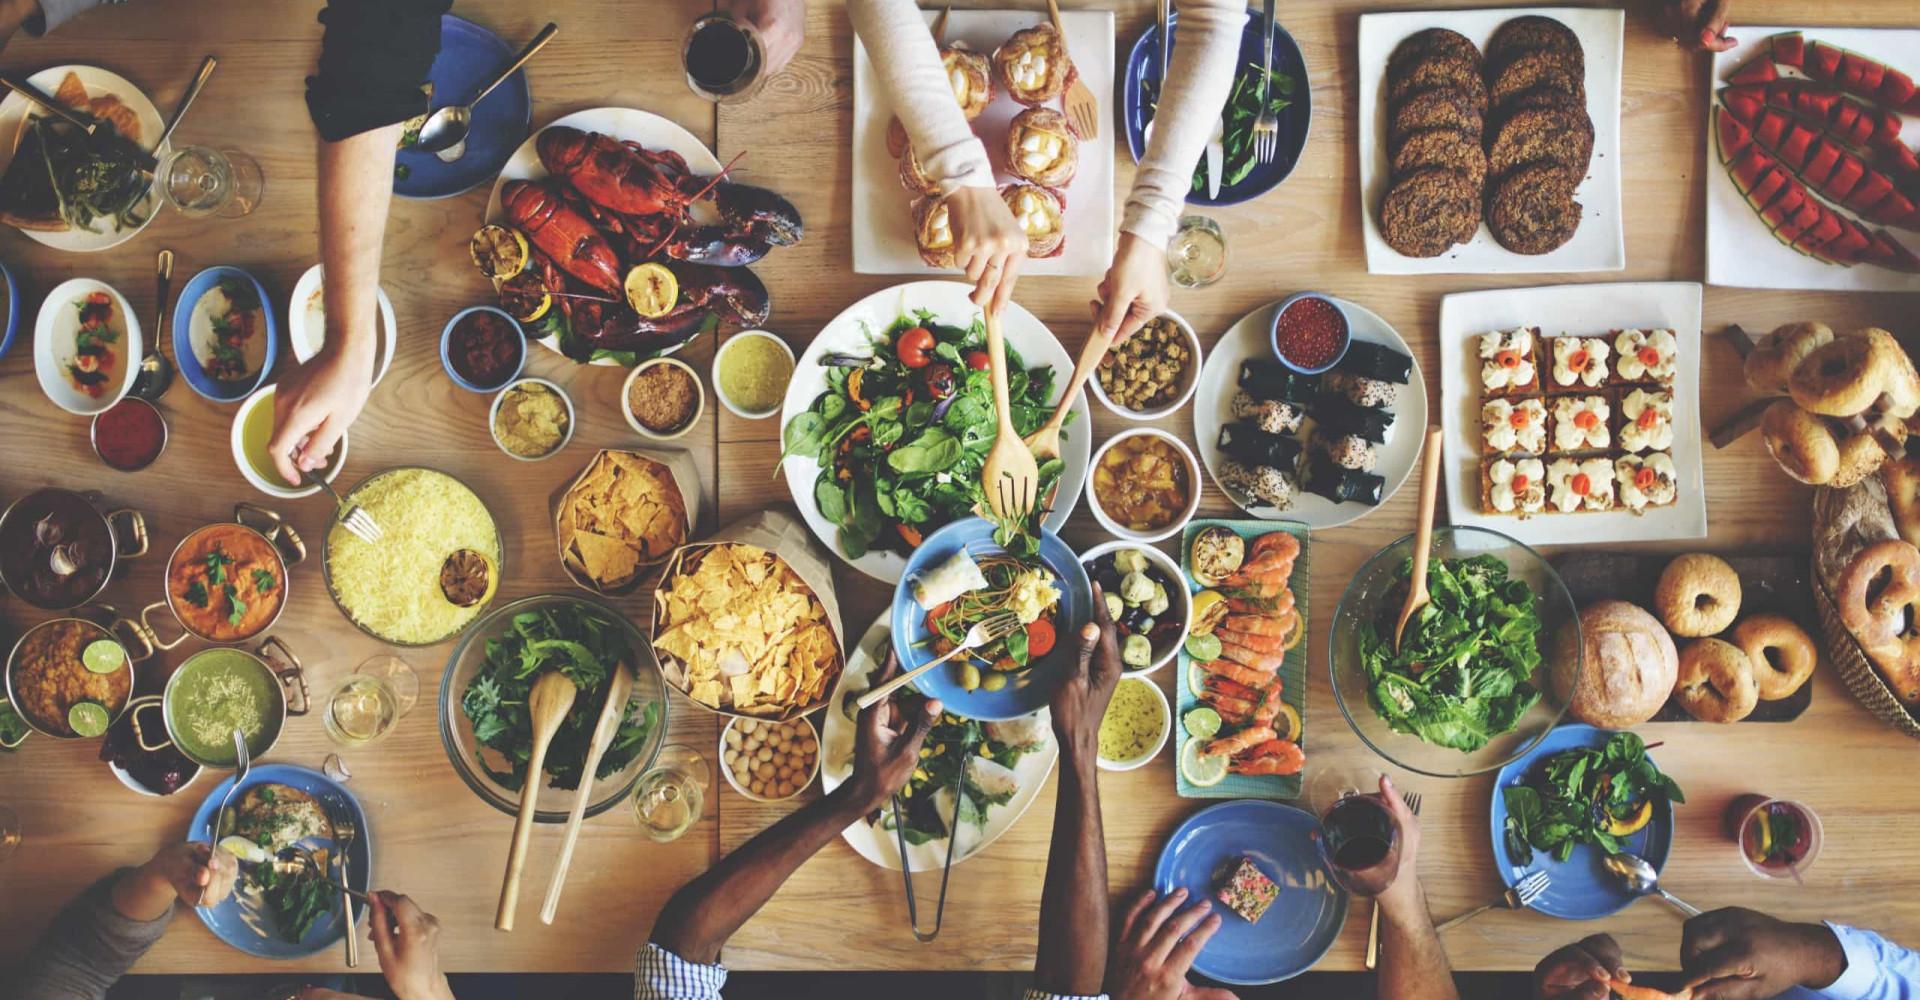 Food fusions: gastronomic genius or betrayal?